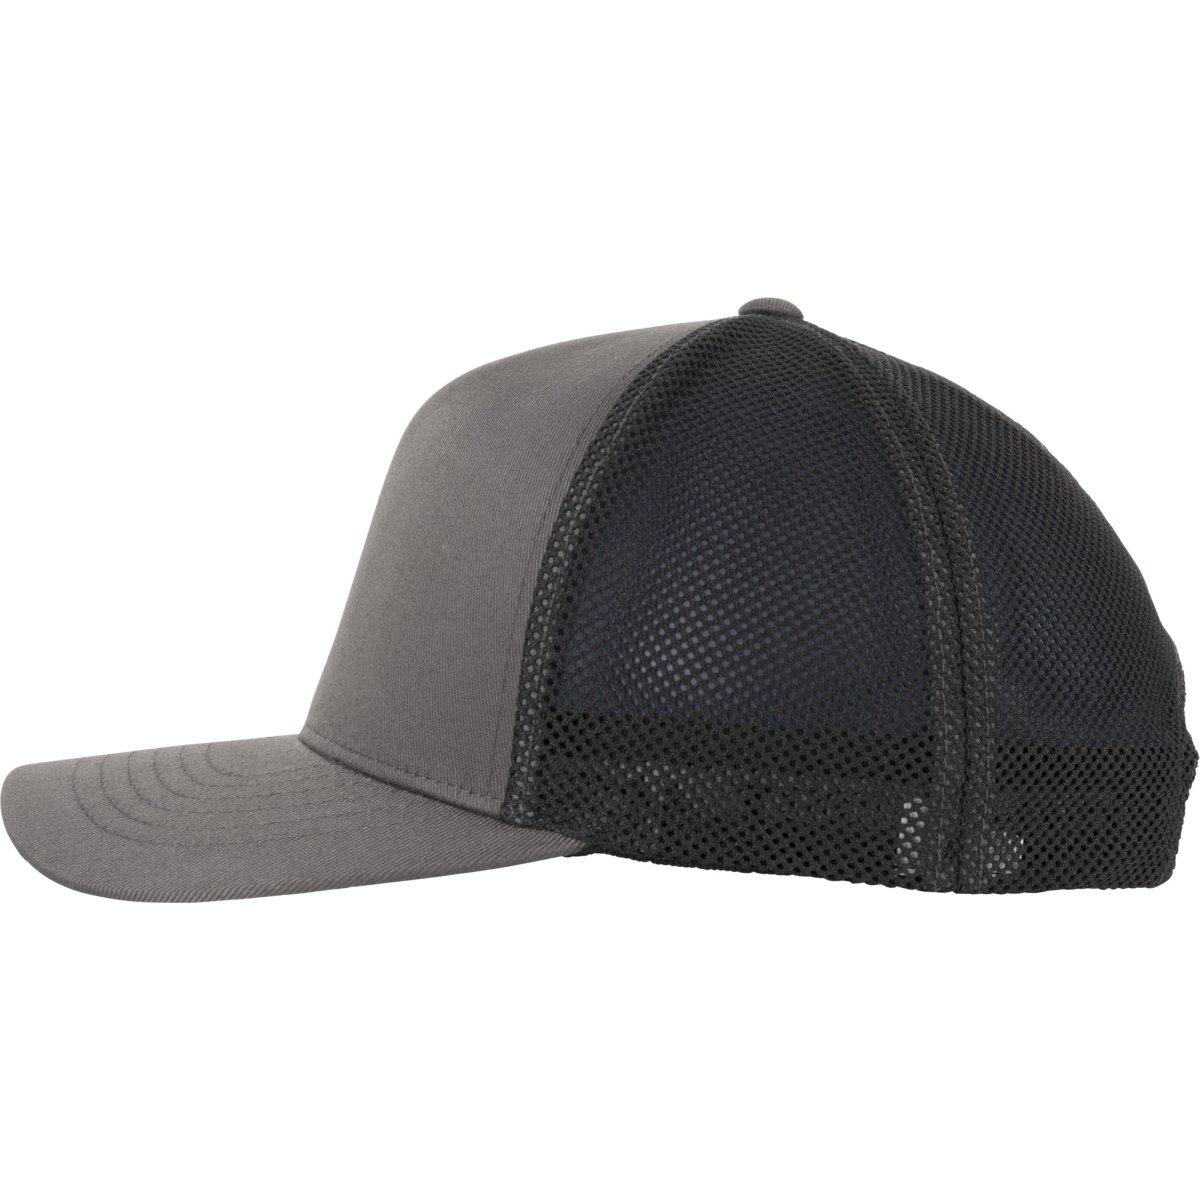 8056e72eabc Flexfit Stretch Sports Fitness Pro-Formance 110 Mesh Cap - One Size ...